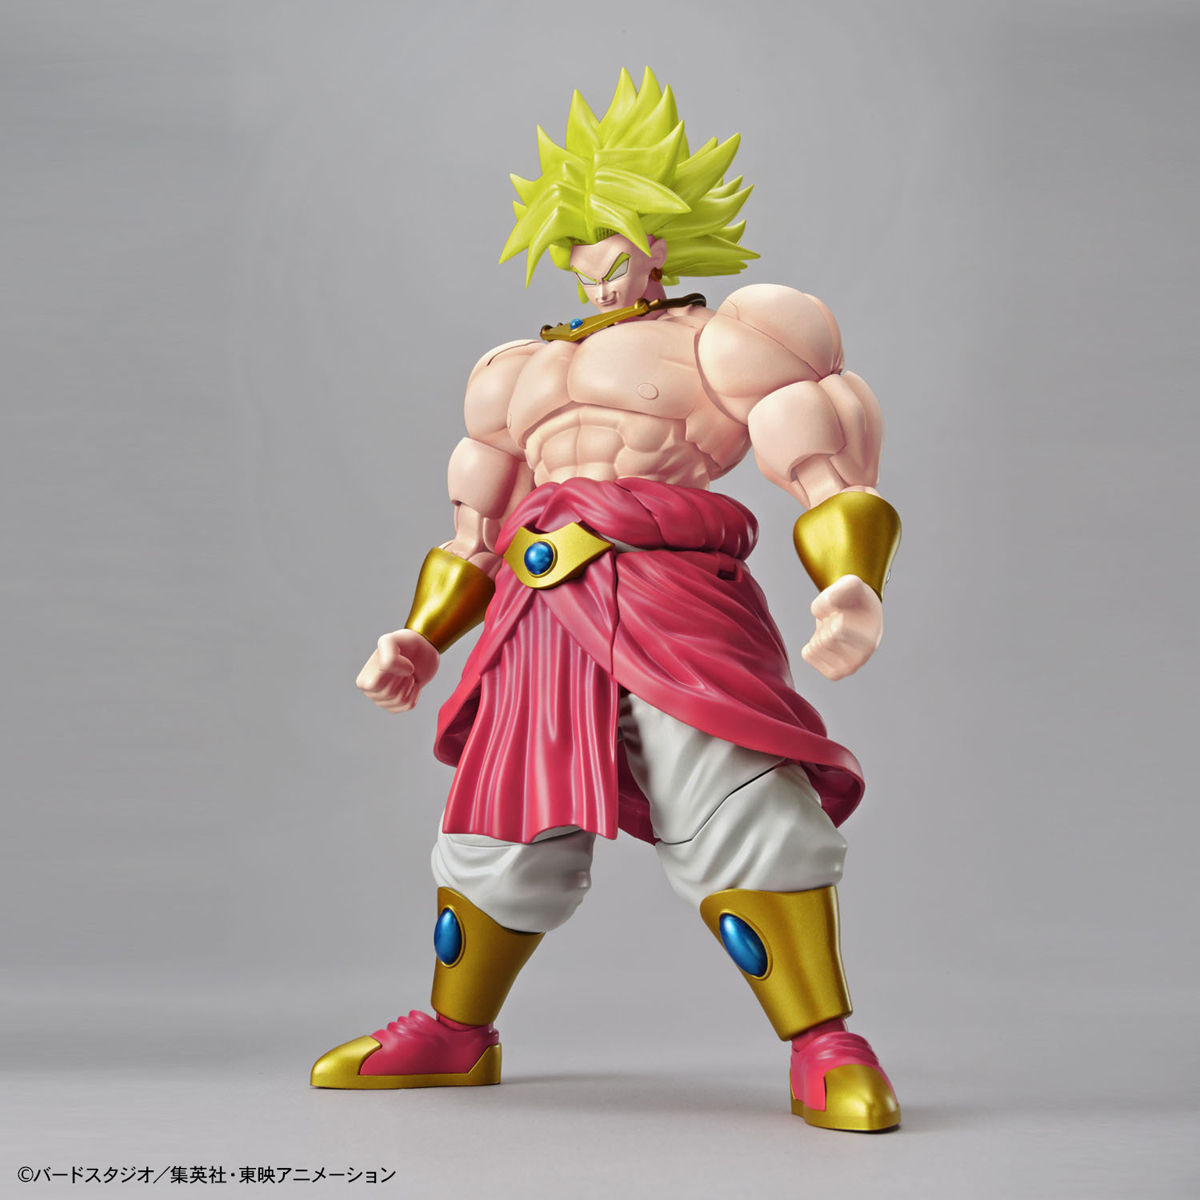 Bandai Figure Rise Model Kit Renew Dragon Ball Z Legendary Super Saiyan Broly